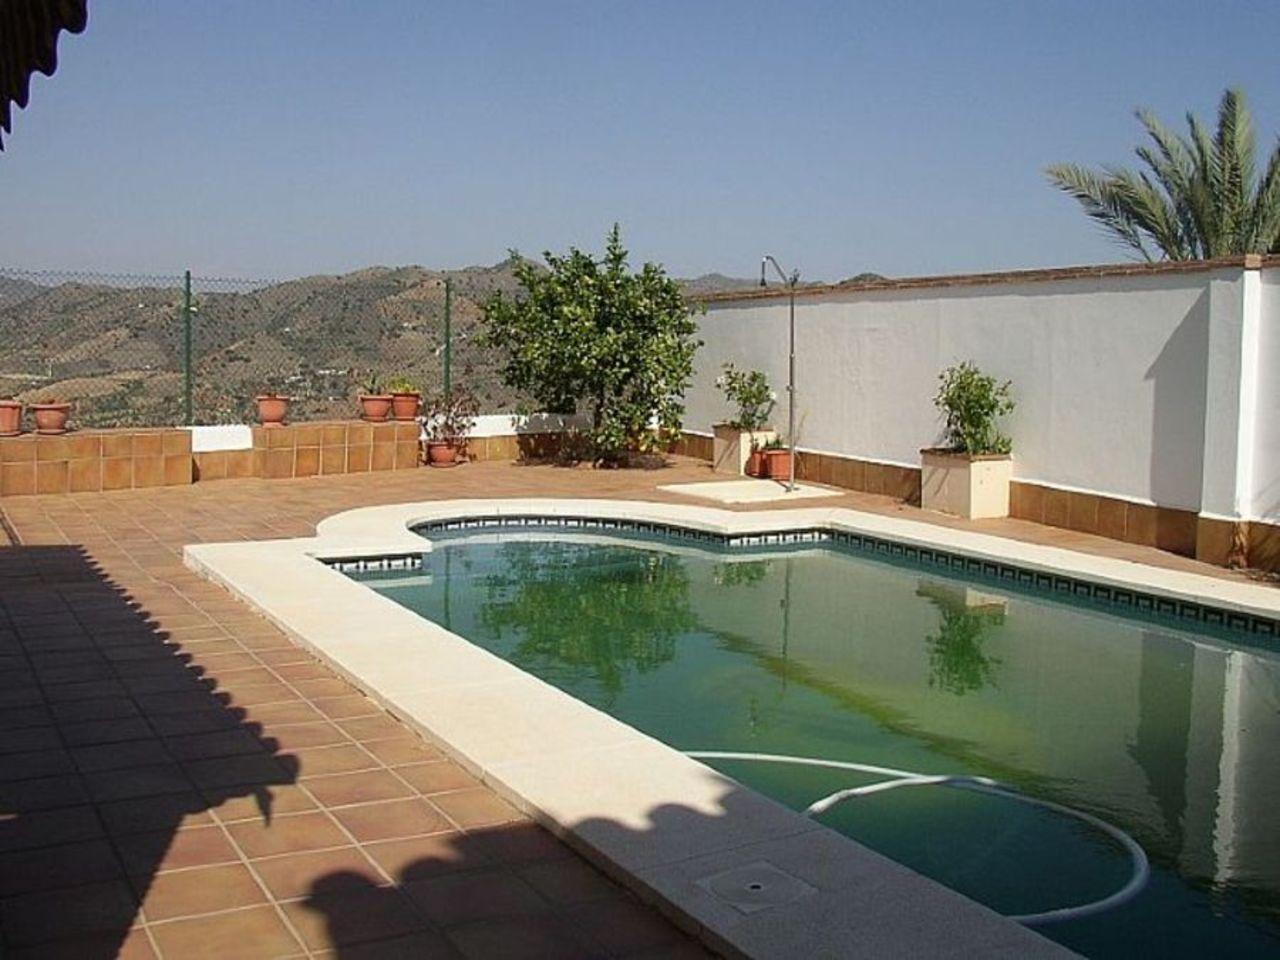 Ref: AP873 4 Bedrooms Price 230,000 Euros